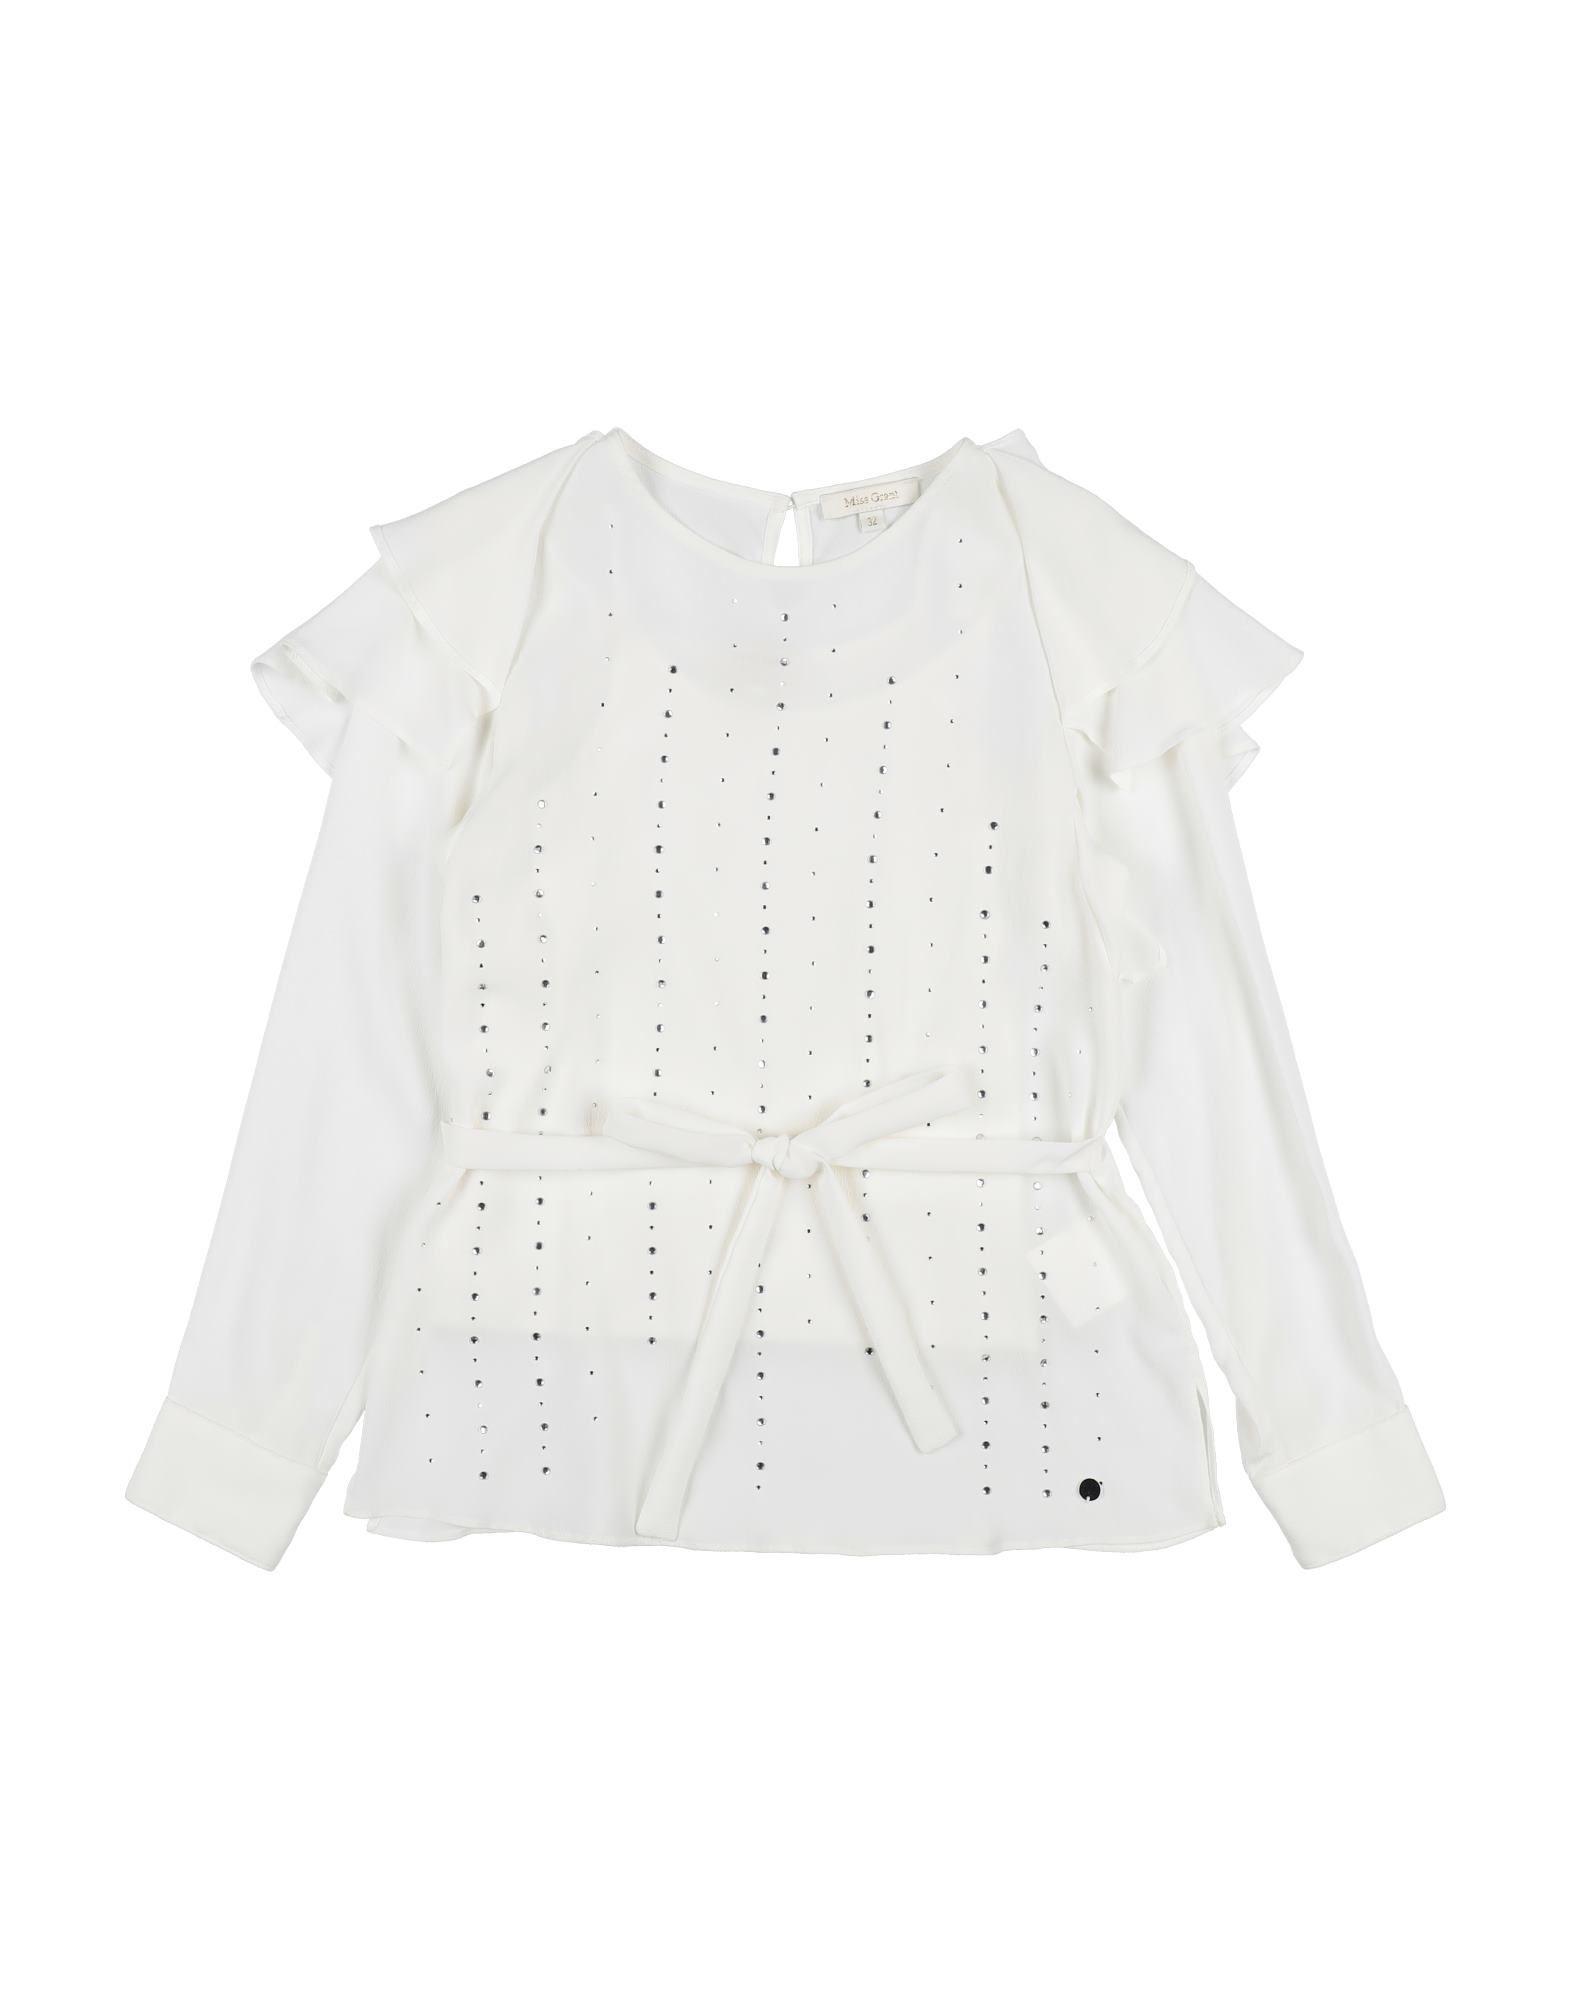 martin grant блузка MISS GRANT Блузка